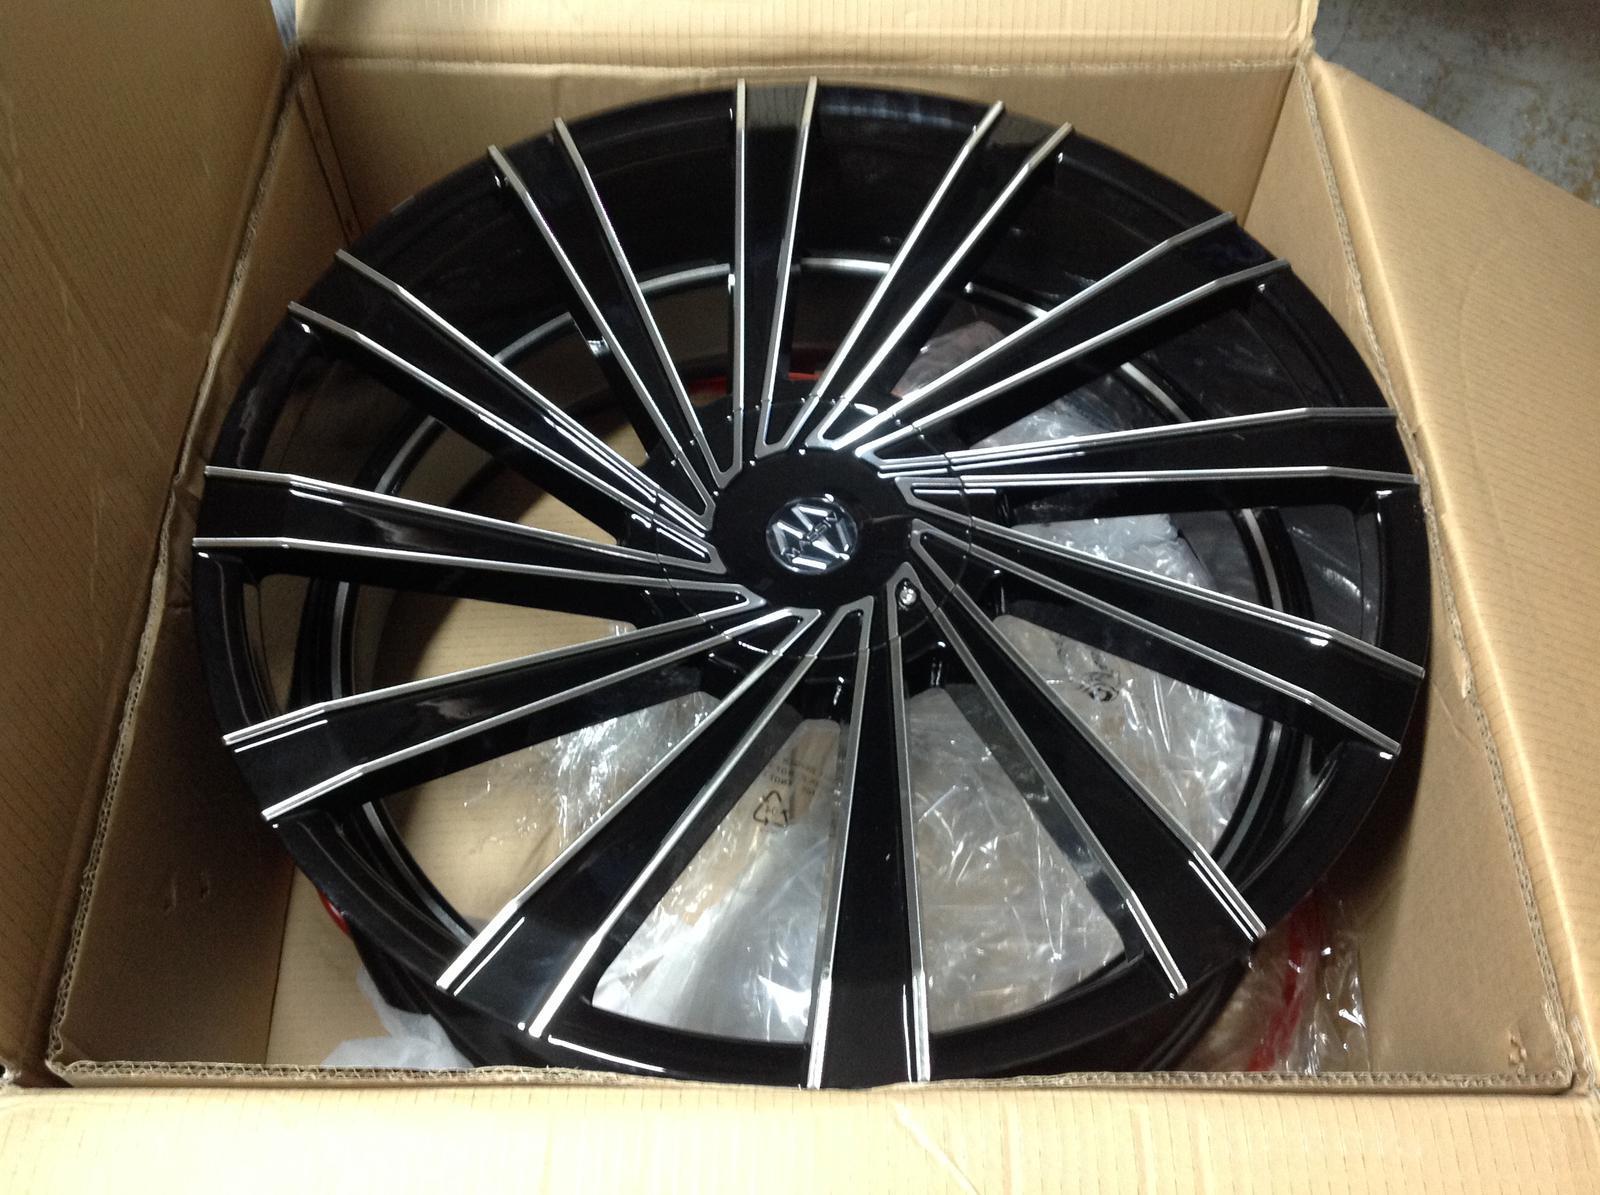 Massiv Wheels Custom Wheel Connection West Palm Beach Fl 561 697 1888 2015 Dodge Charger 921 Black Machined